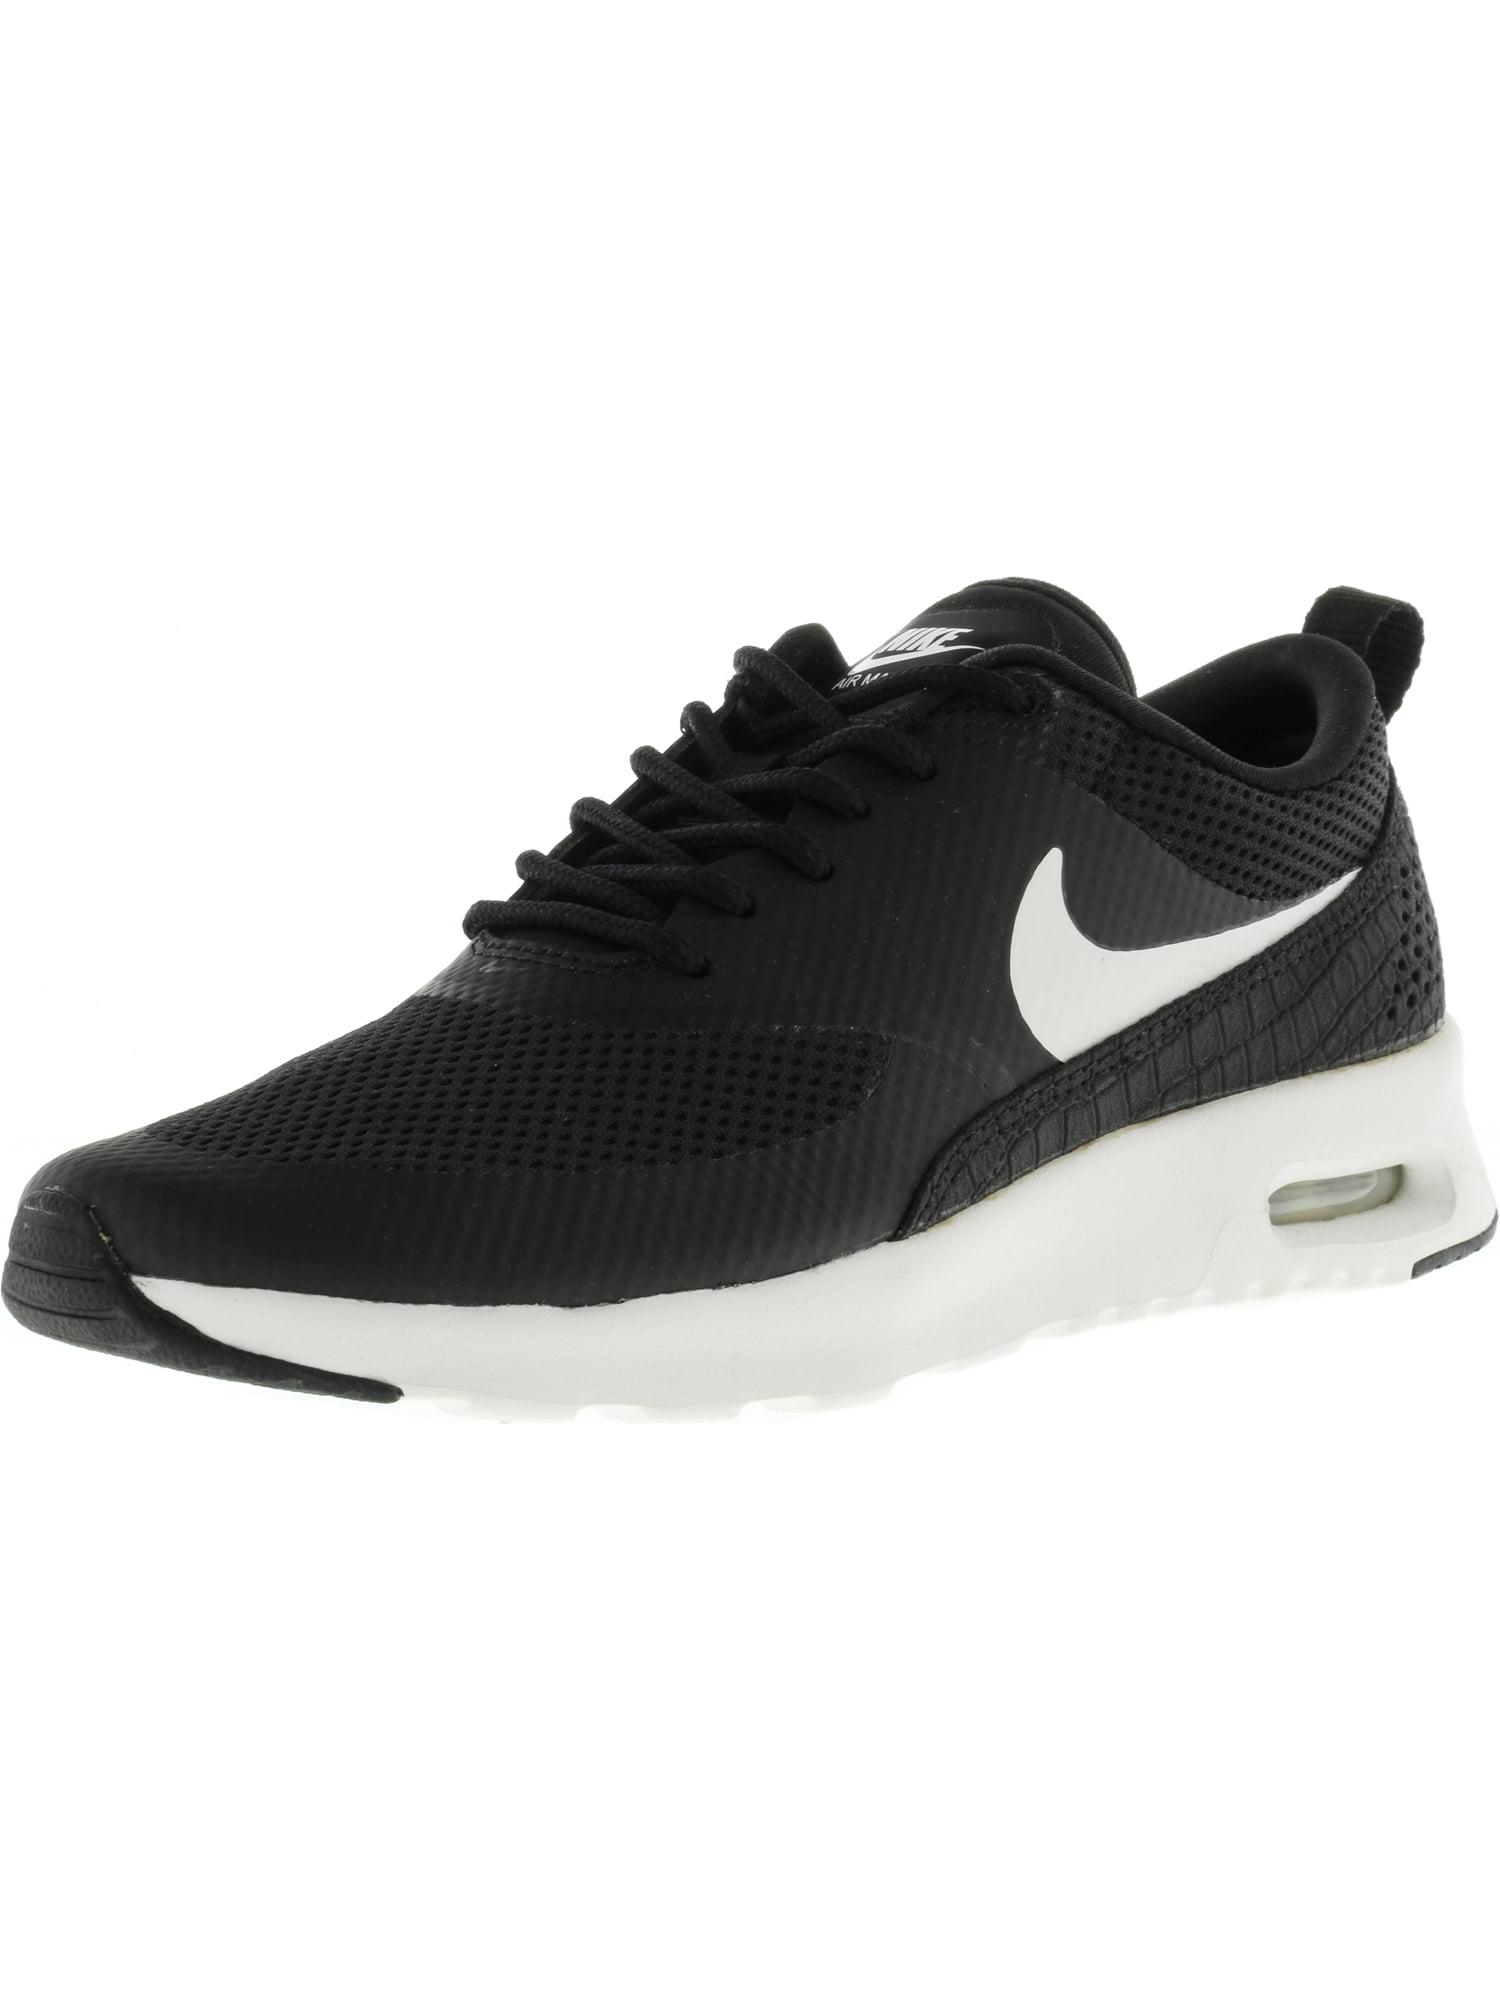 Nike Women's Air Max Thea Black / Summit White Ankle-High Running Shoe - 8M